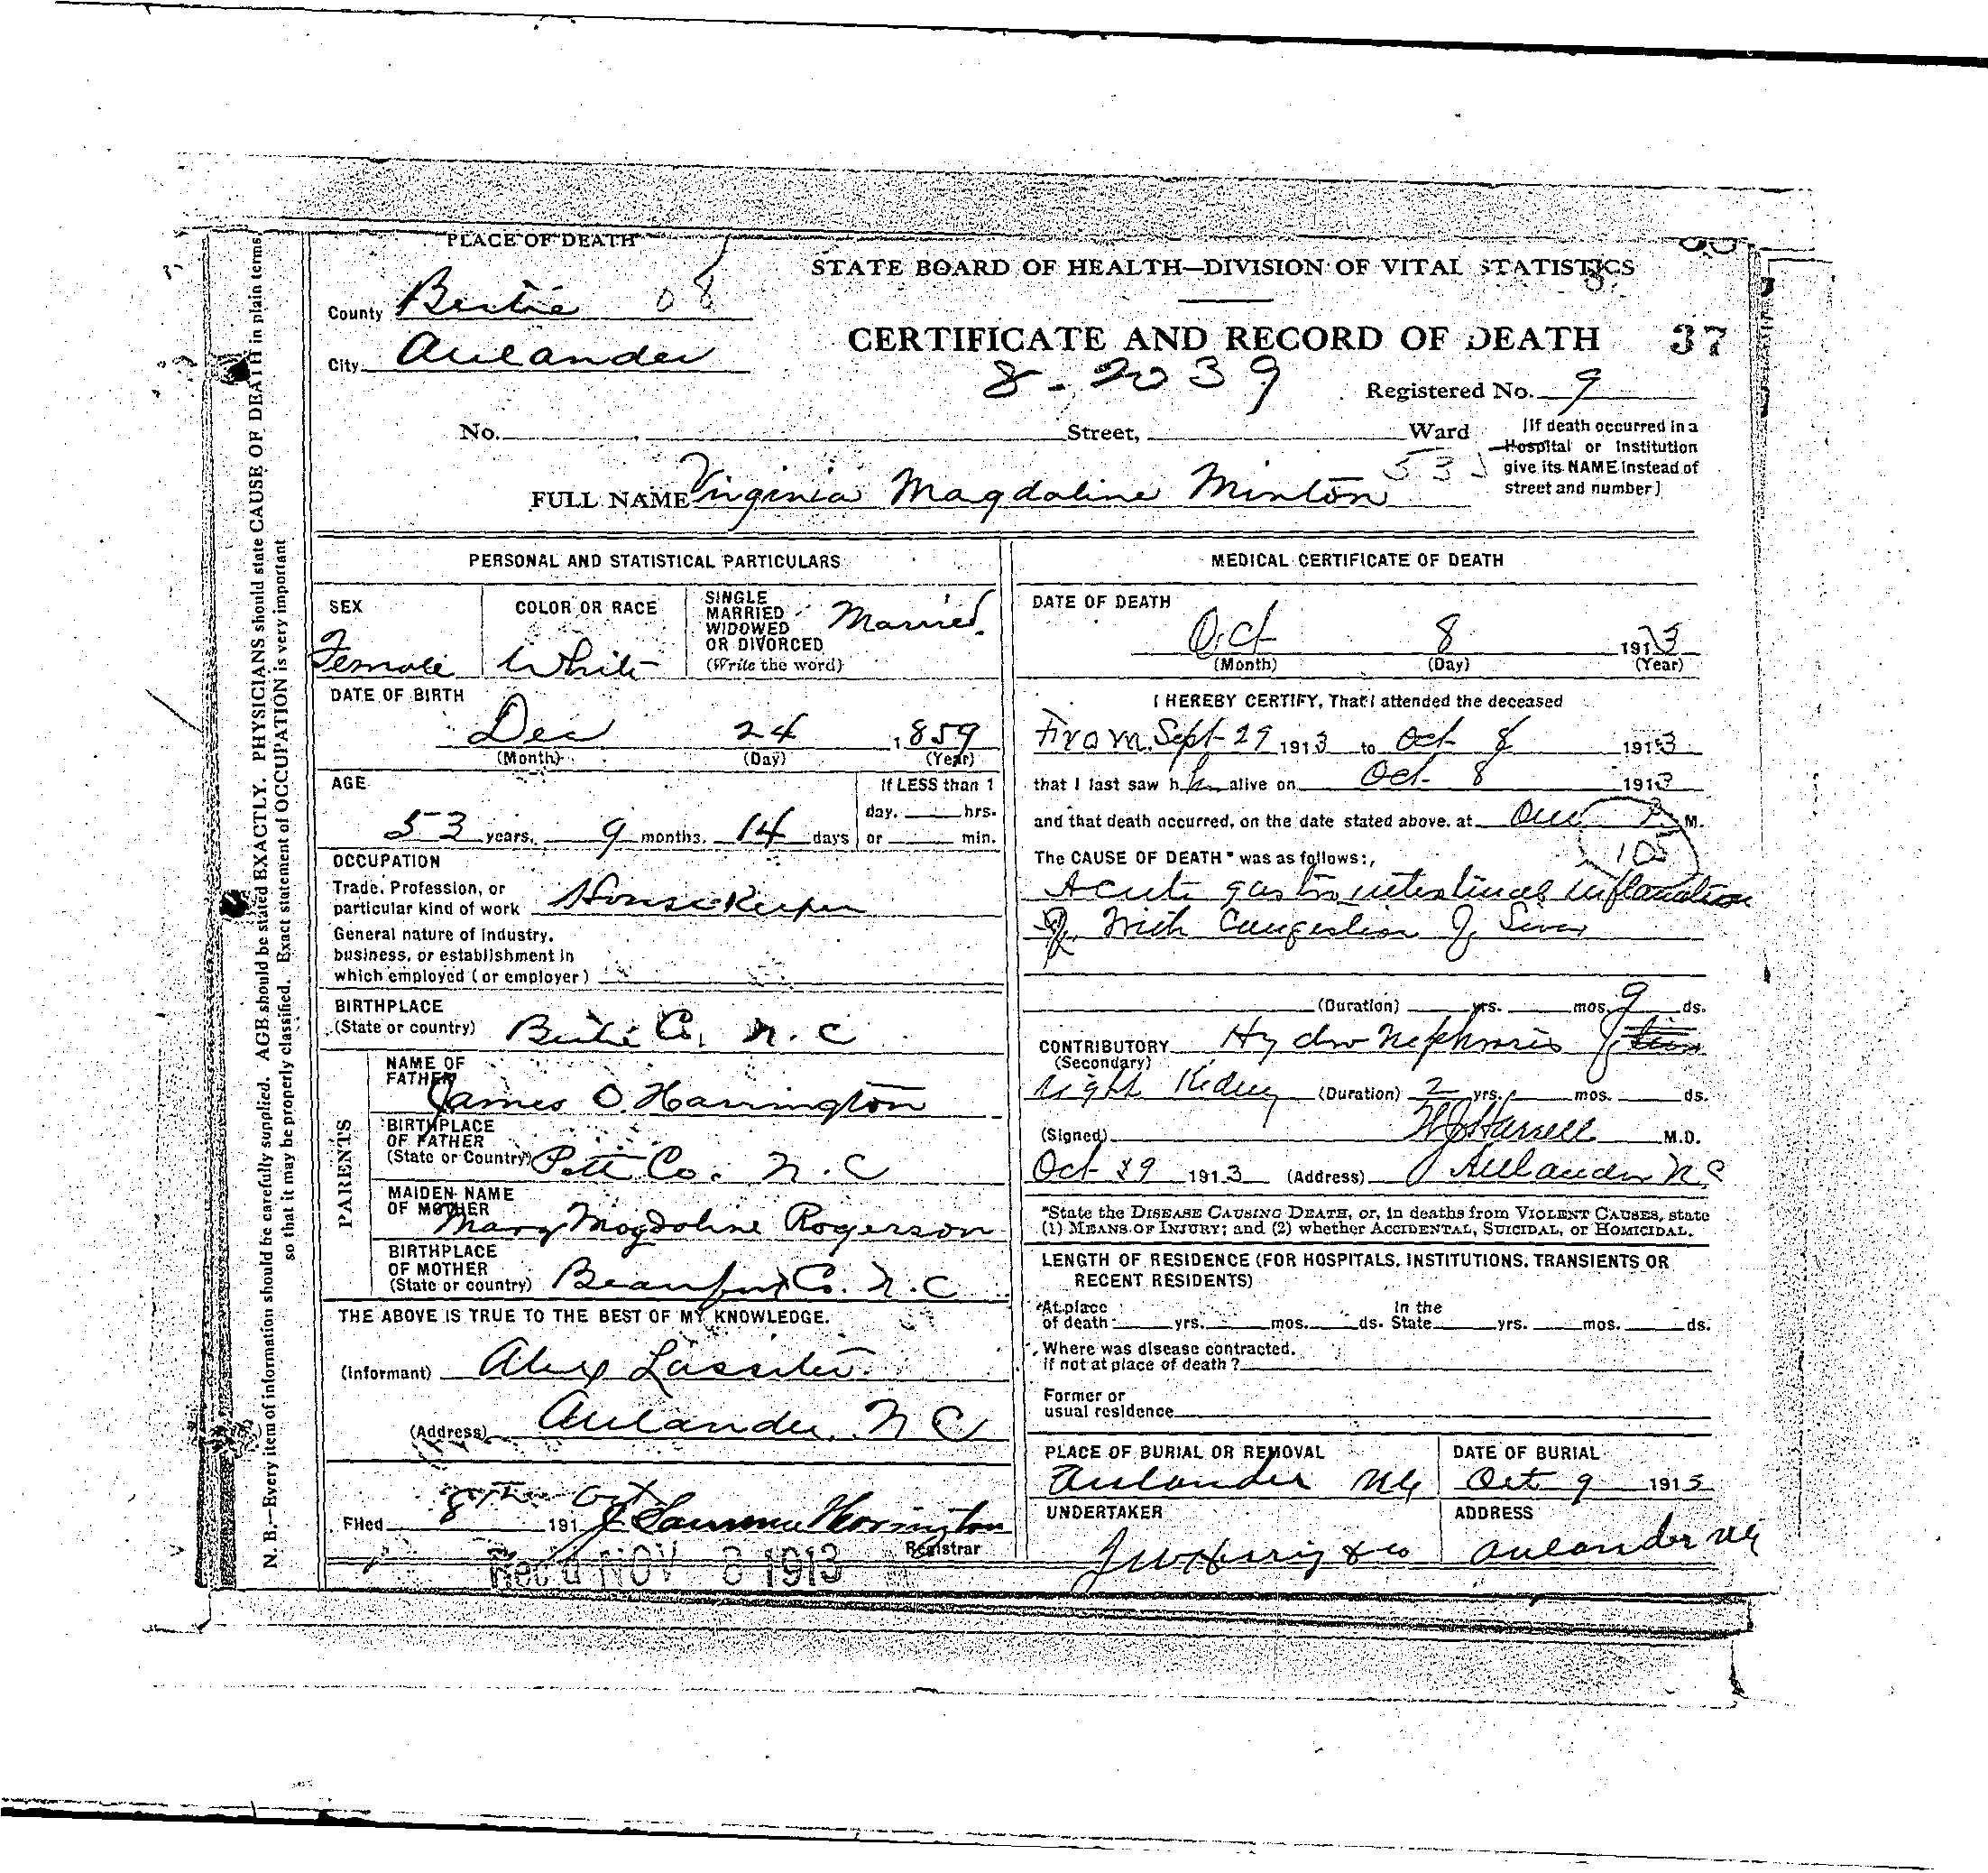 Death Certificate For Virginia Magdaline Harrington Minton My